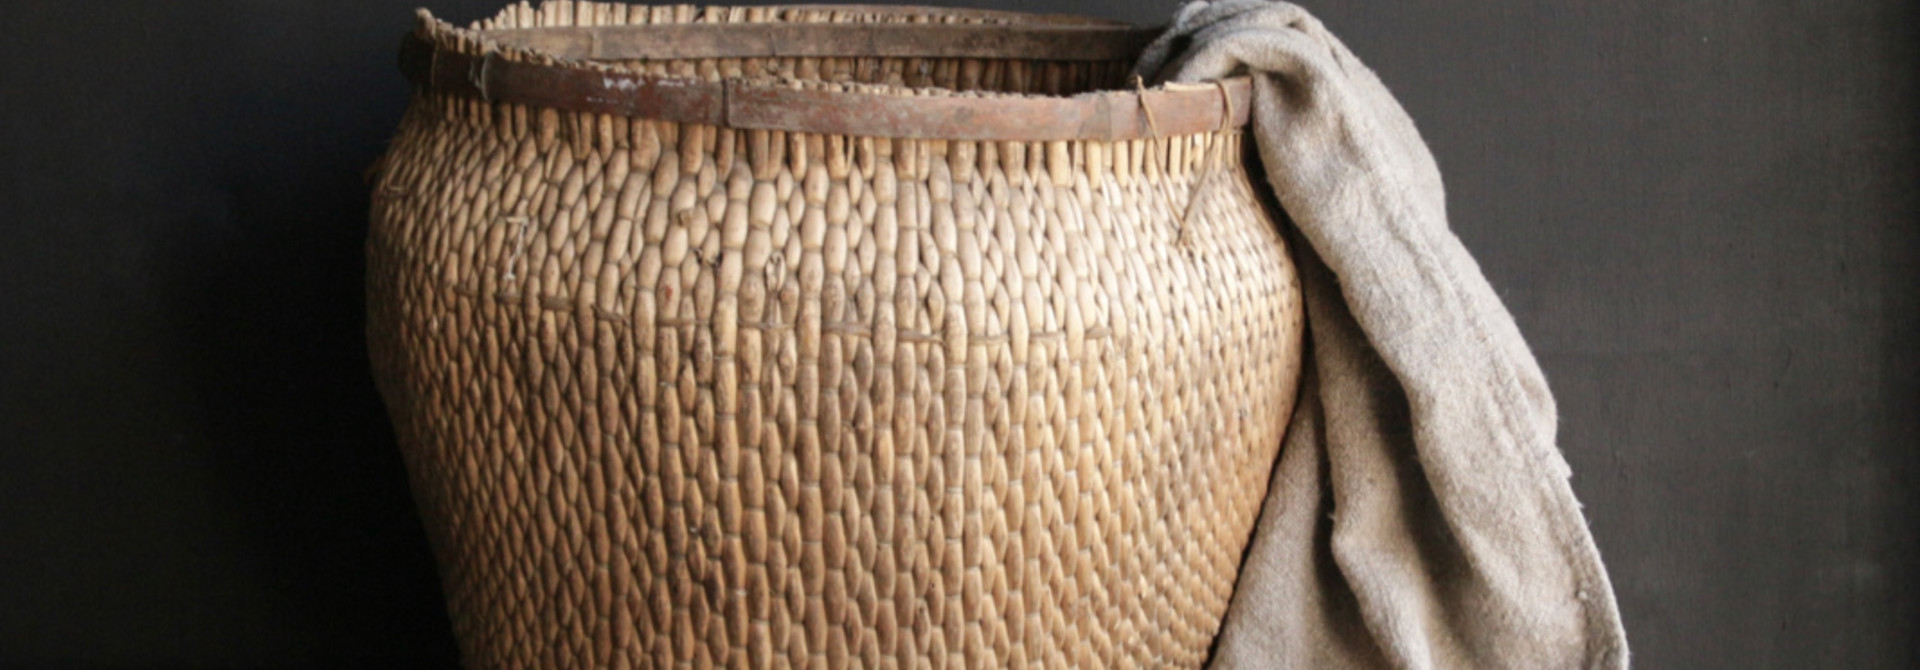 Unieke oude authentieke grote rieten mand